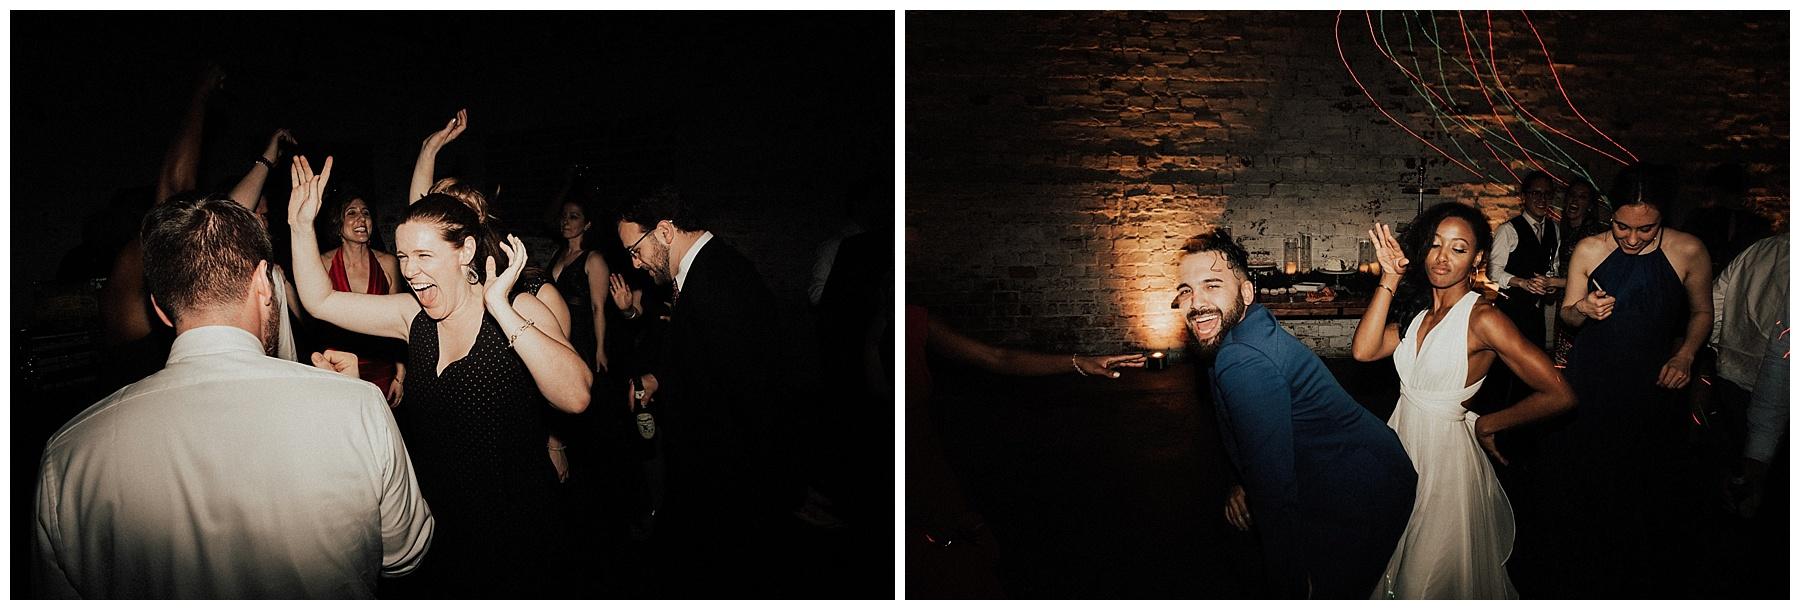 Rialto Theatre Tampa Wedding Photographer-133.jpg